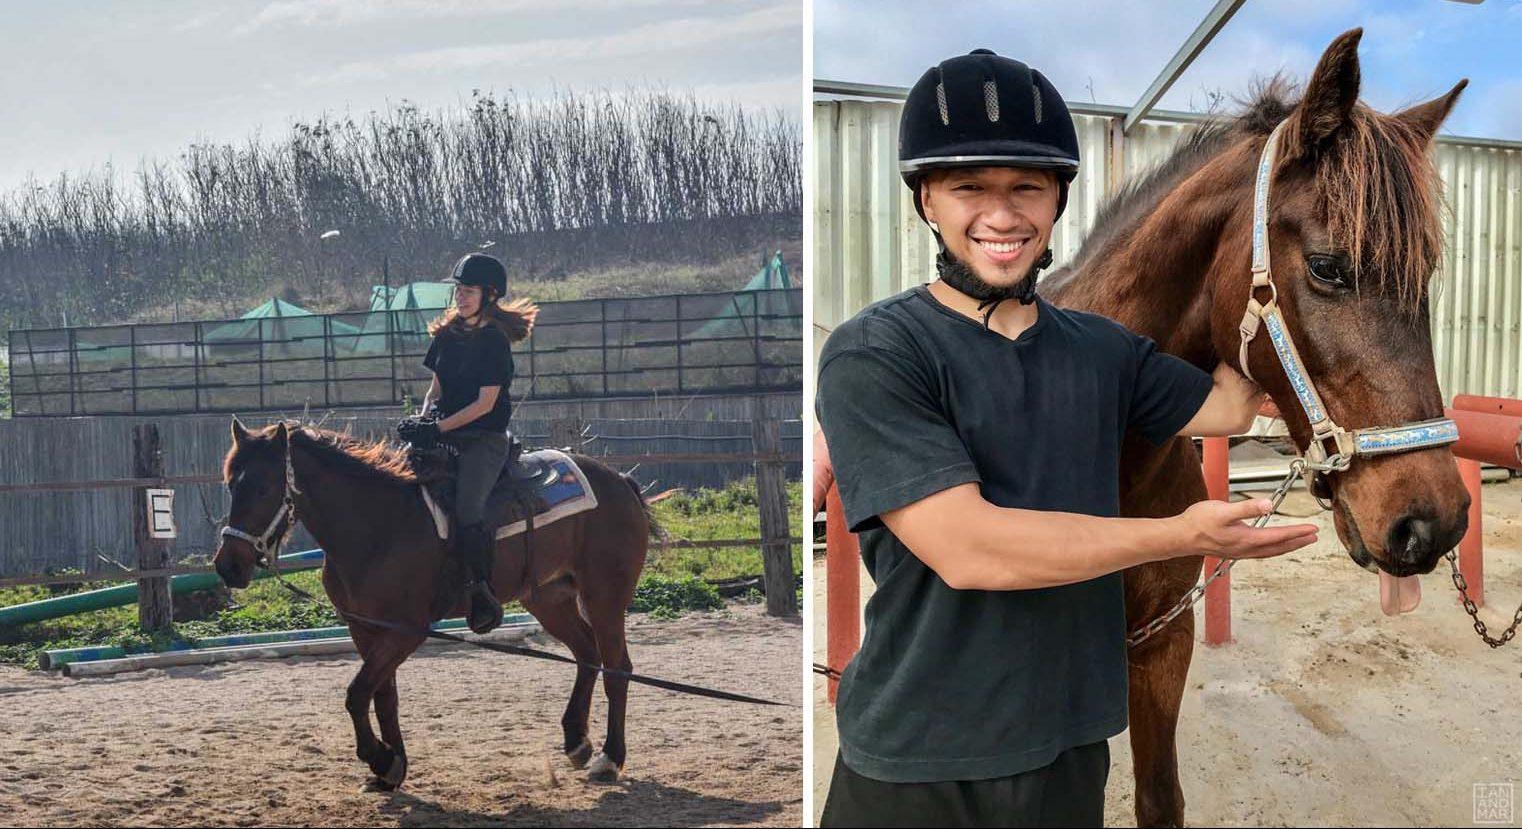 horseback ridign